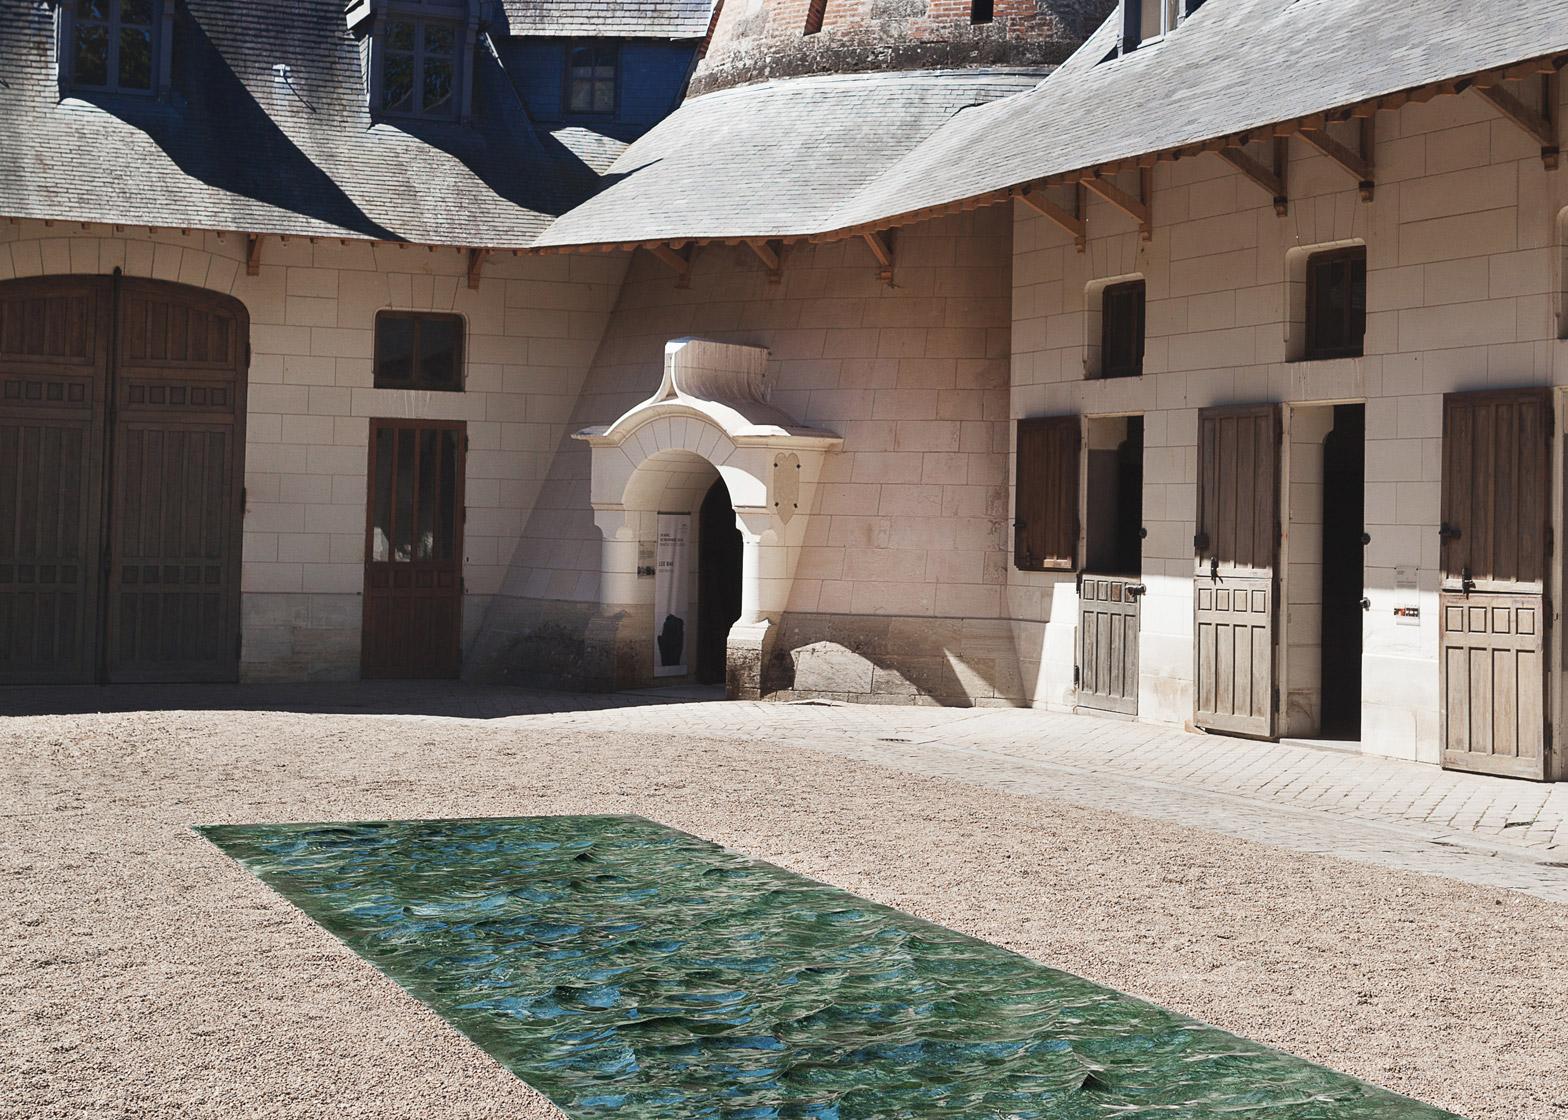 liquid-marble-sculpture-mathieu-lehanneur-installation-landscape-art